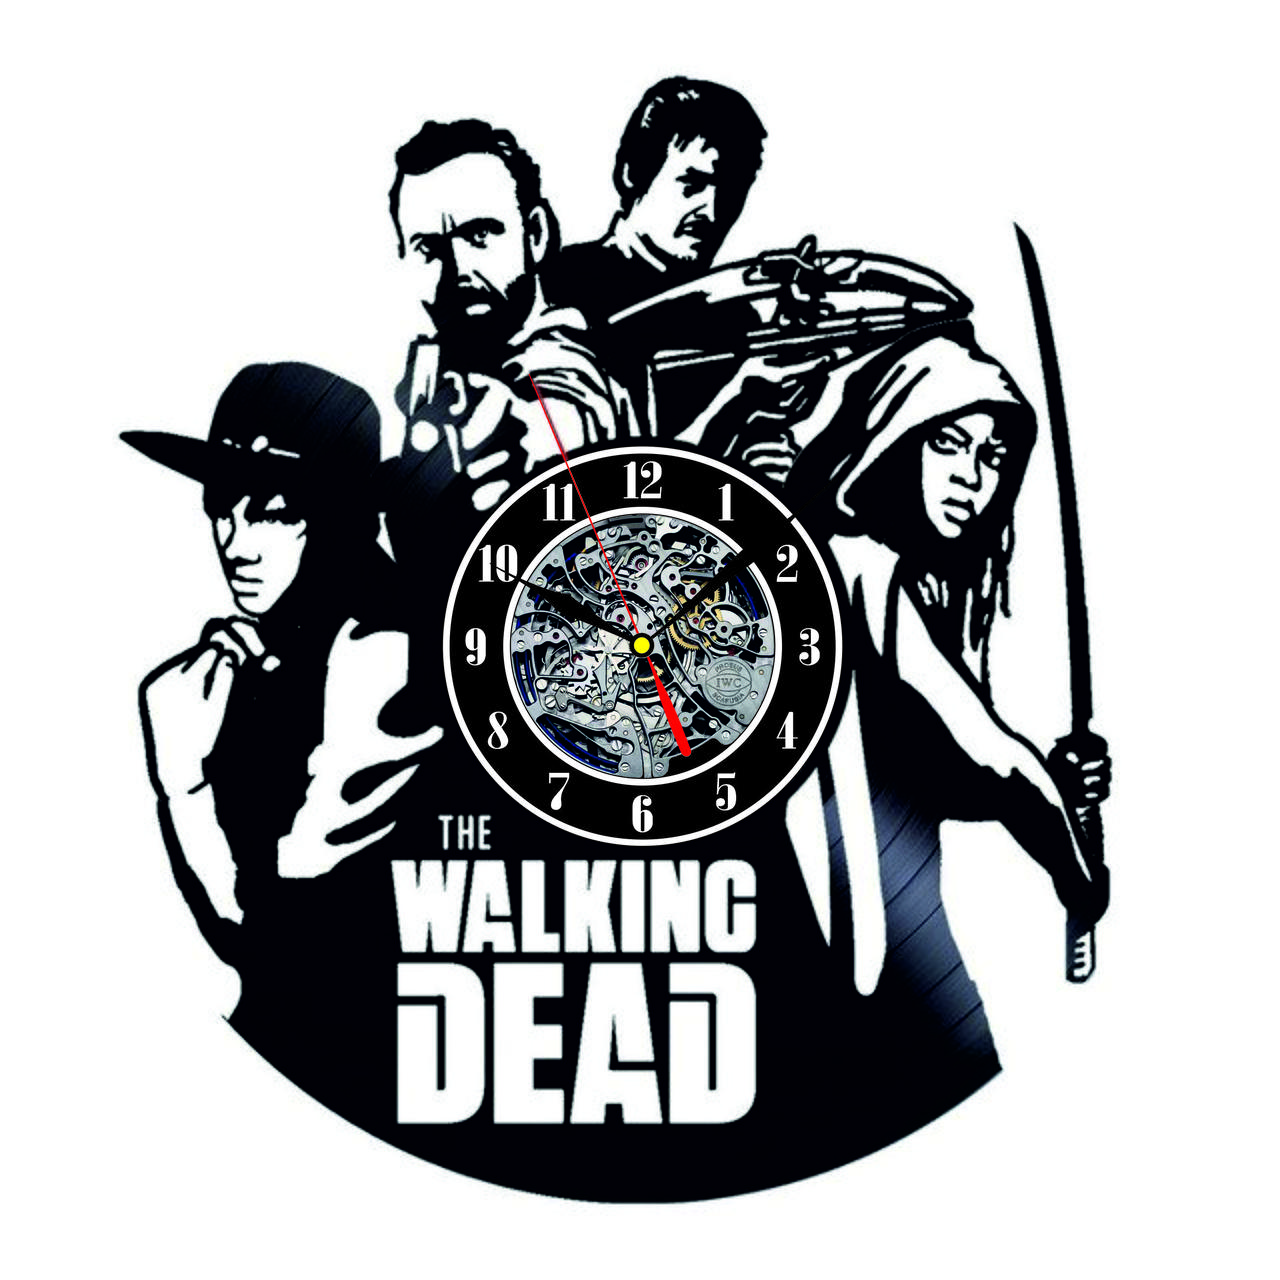 Настенные часы из виниловых пластинок LikeMark Walking Dead